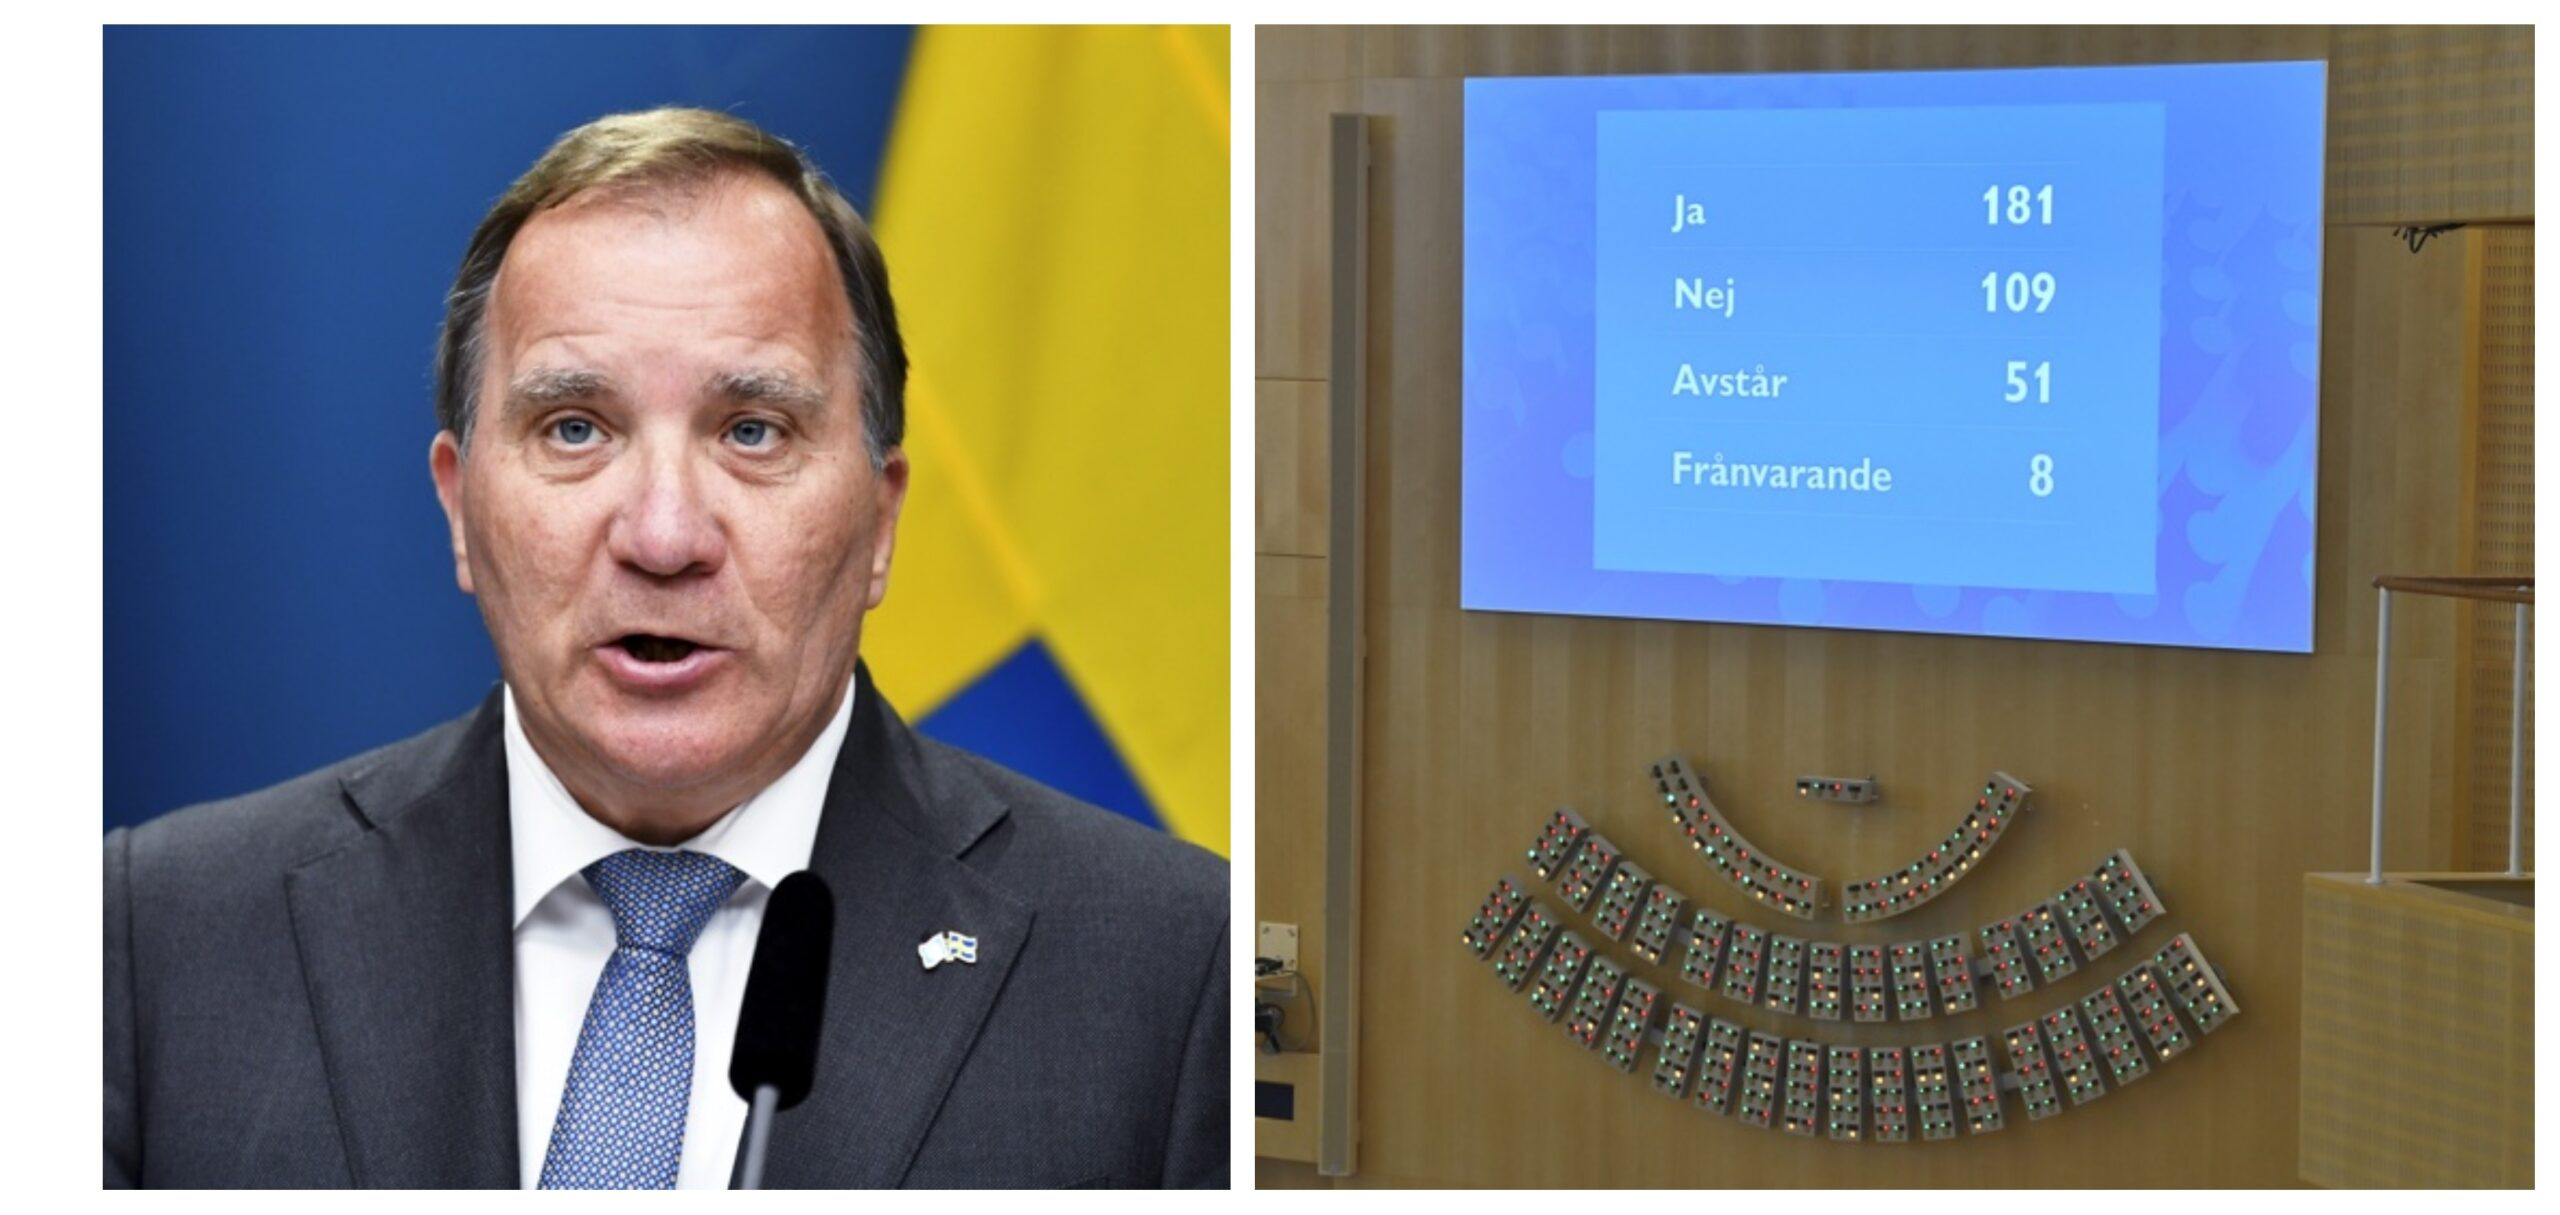 Стефан Льофвен Швеция премиер вот на недоверие